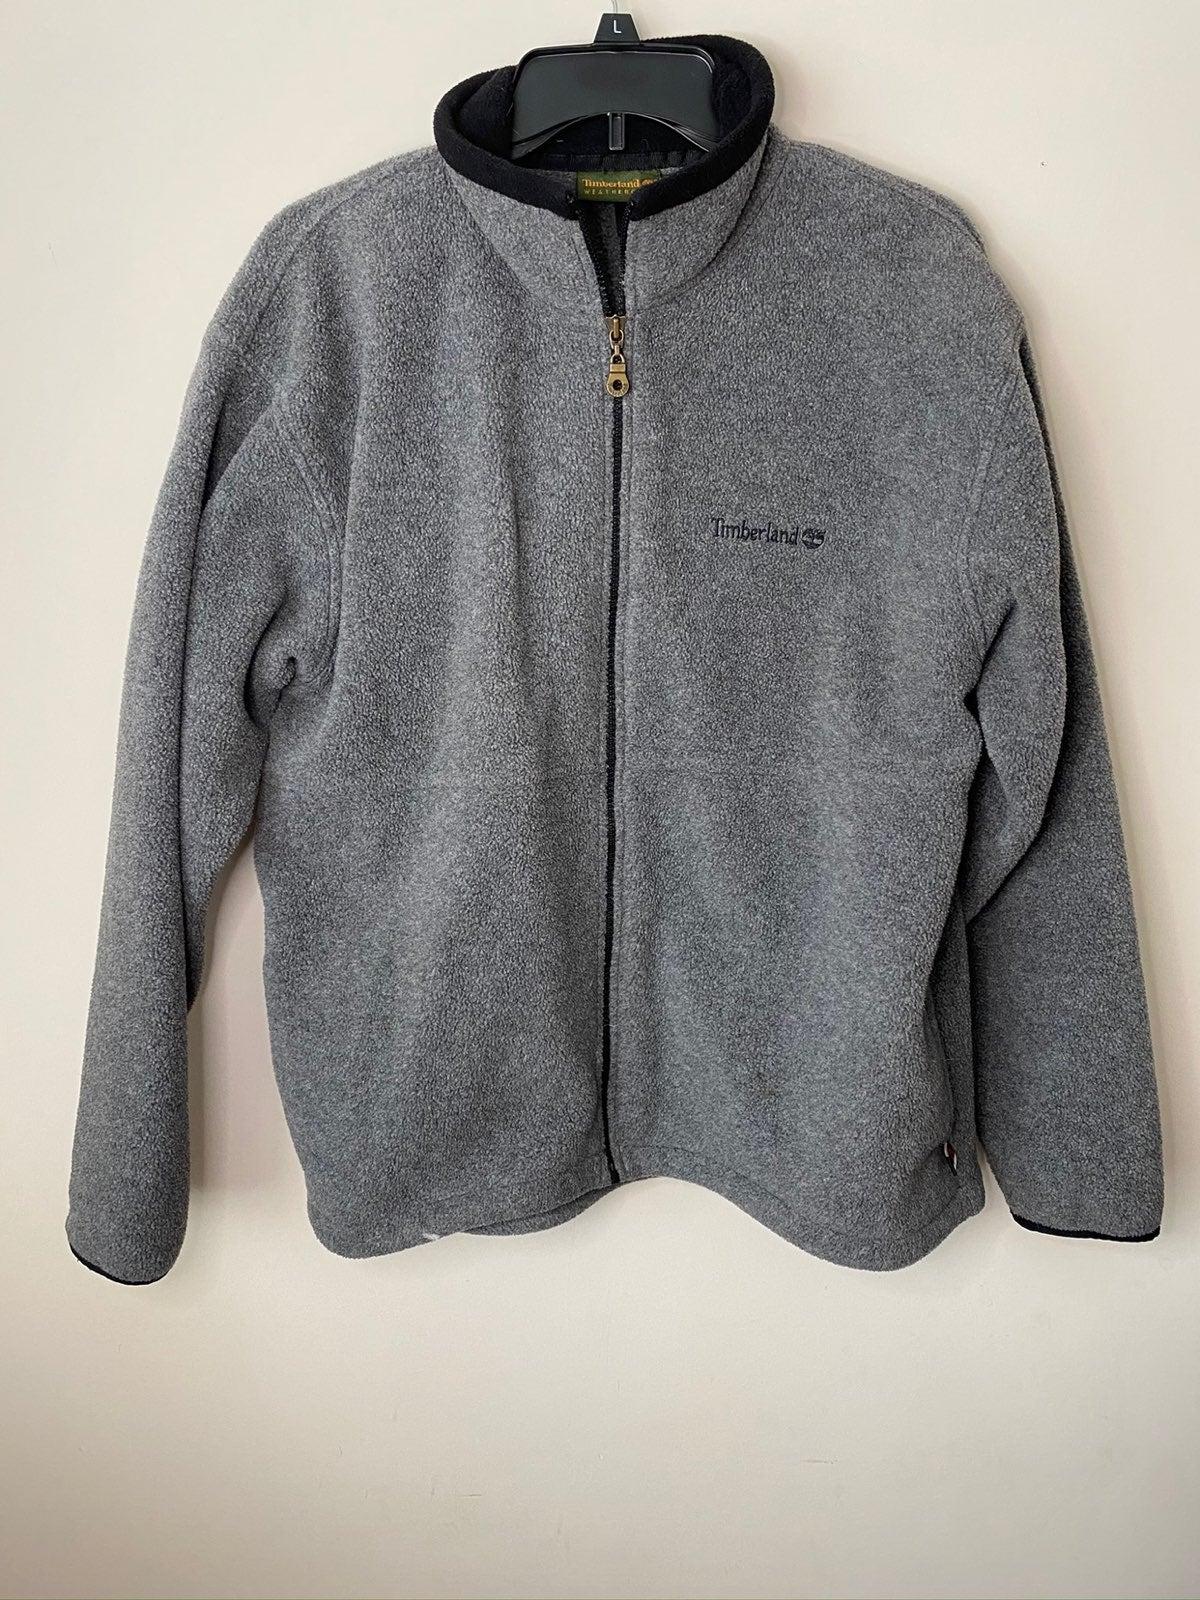 Timberland jacket mens S